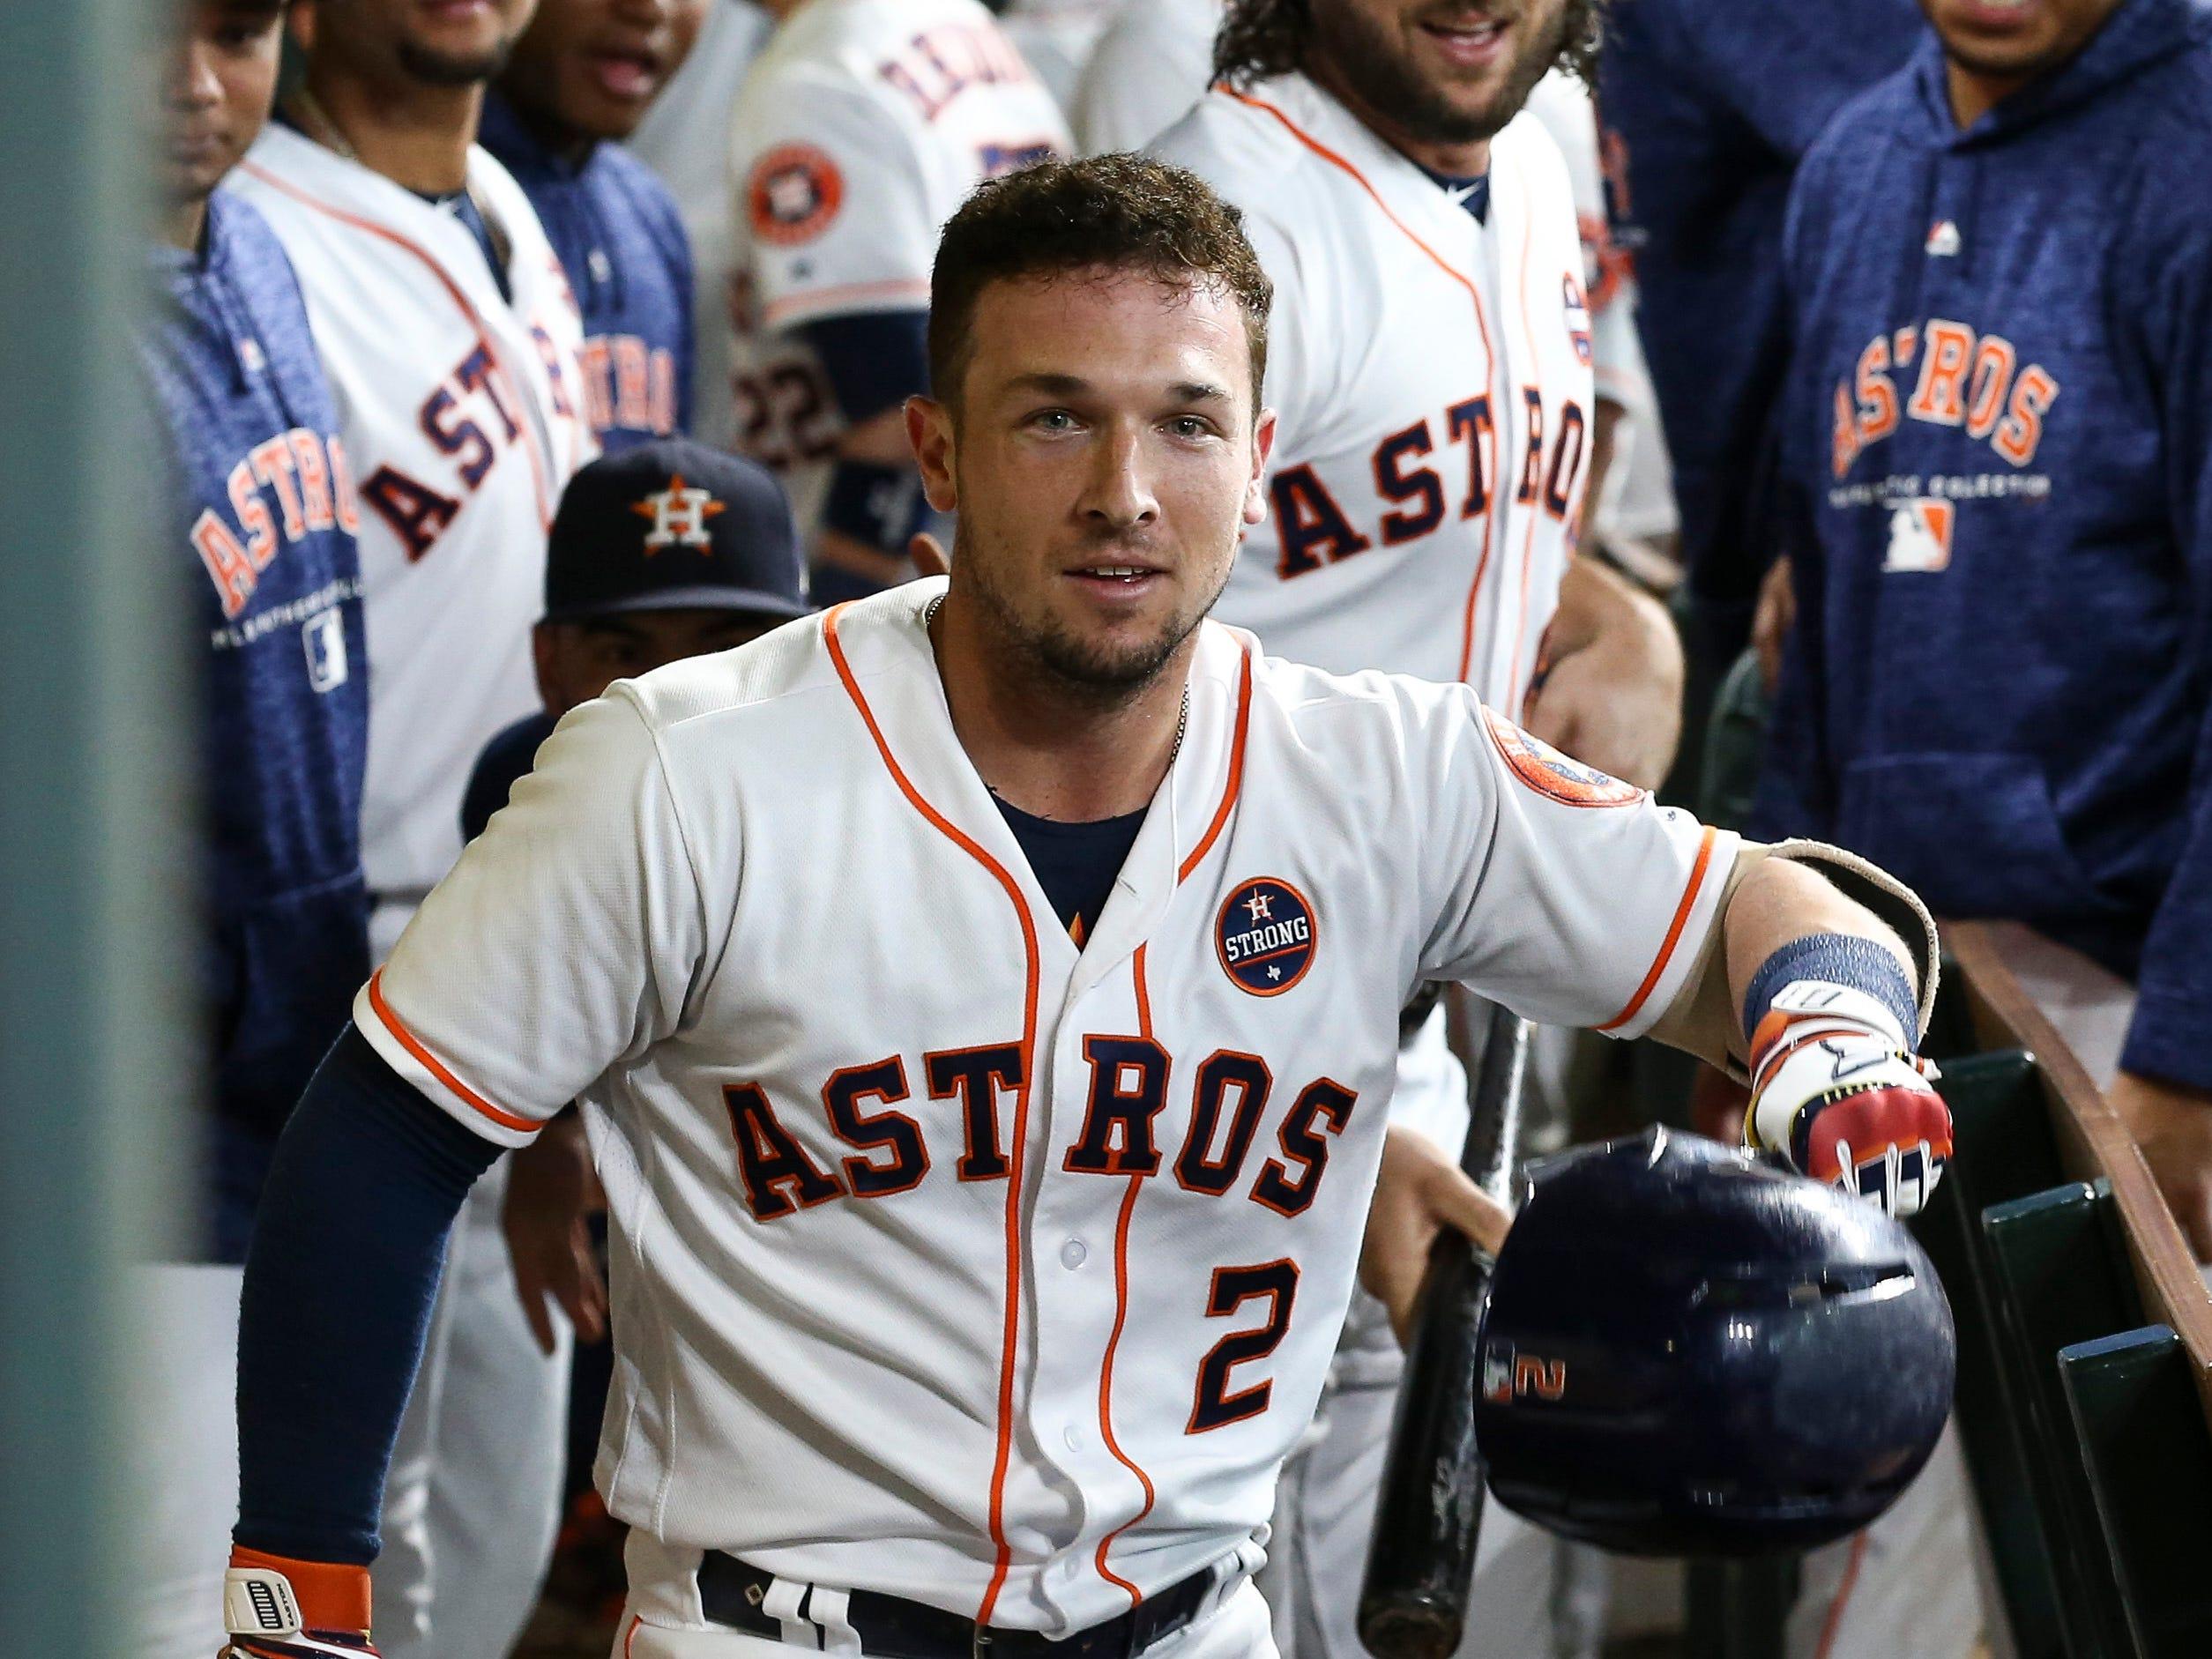 3B Alex Bregman, Astros